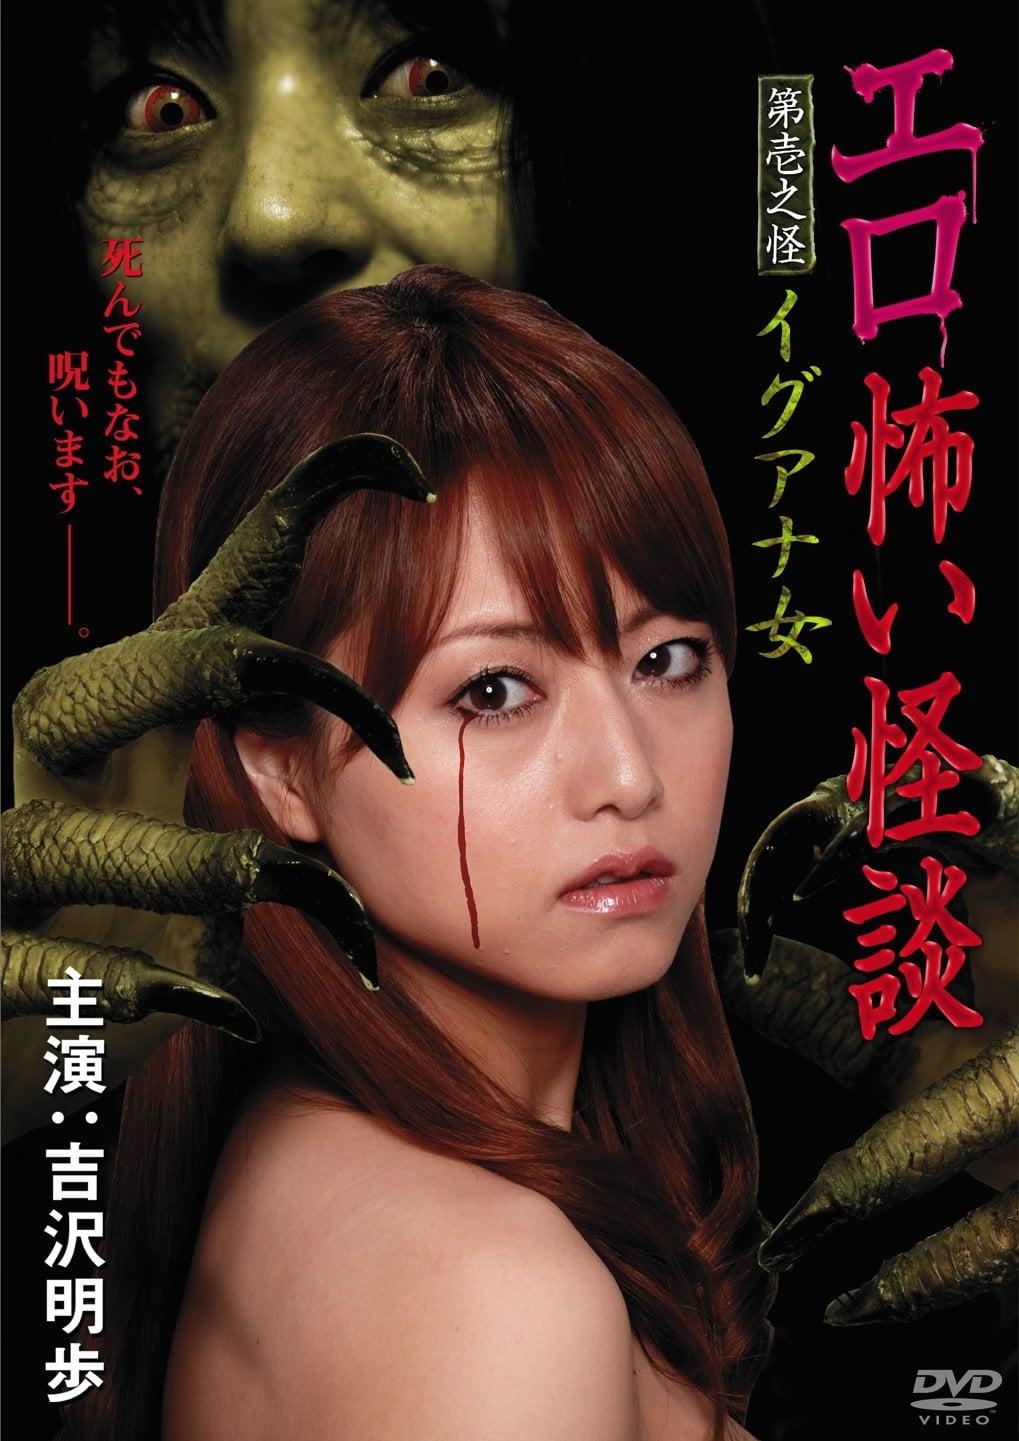 Ero Kowai Kaidan Vol.1 - Erotic Scary Stories Vol.1 - Iguana Woman (2010)